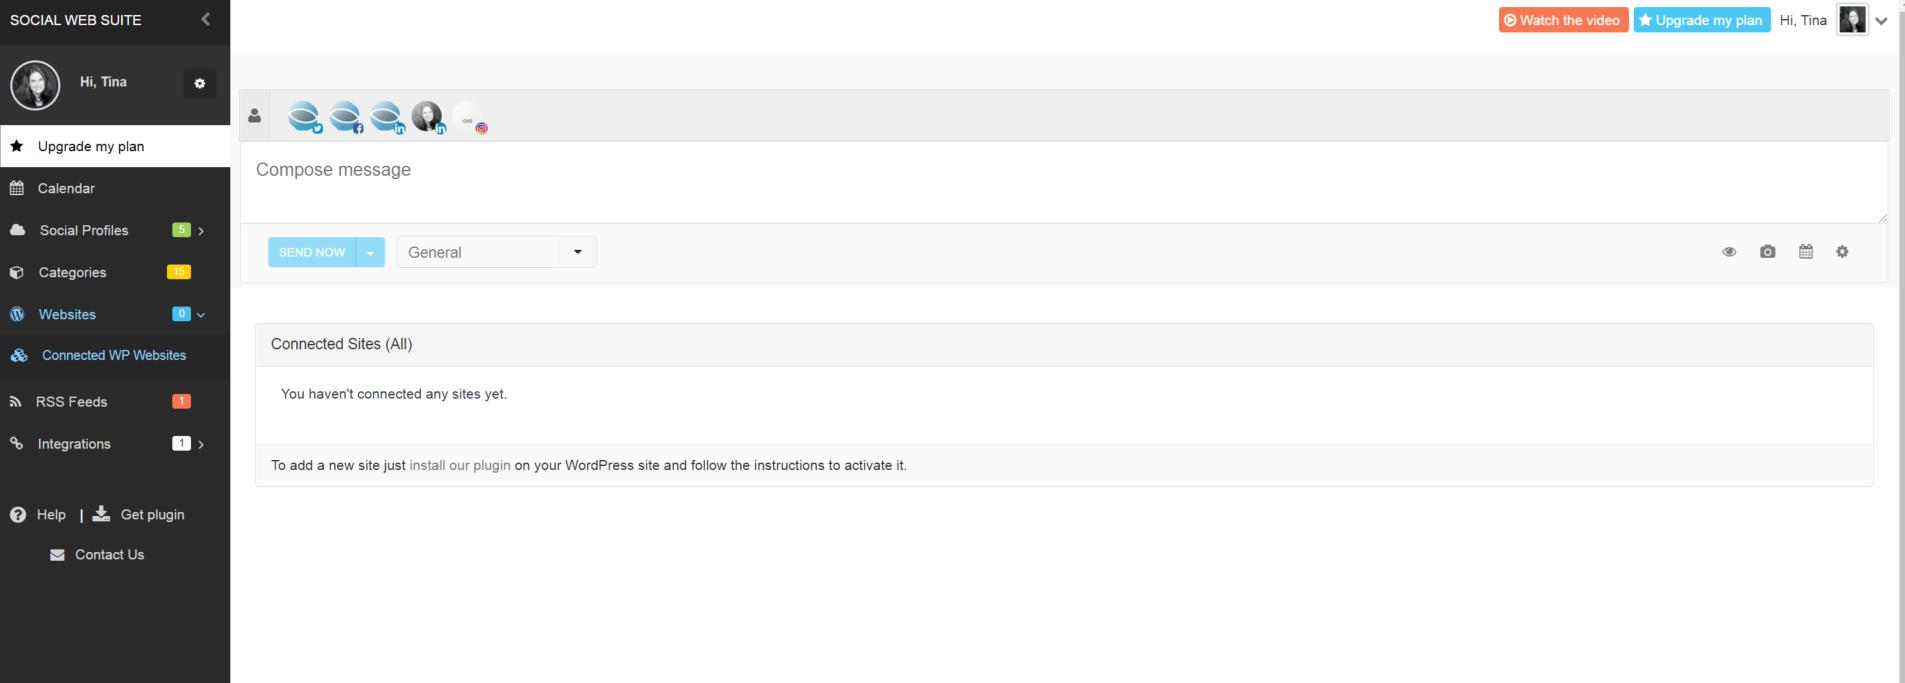 WordPress websites list on SWS dashboard